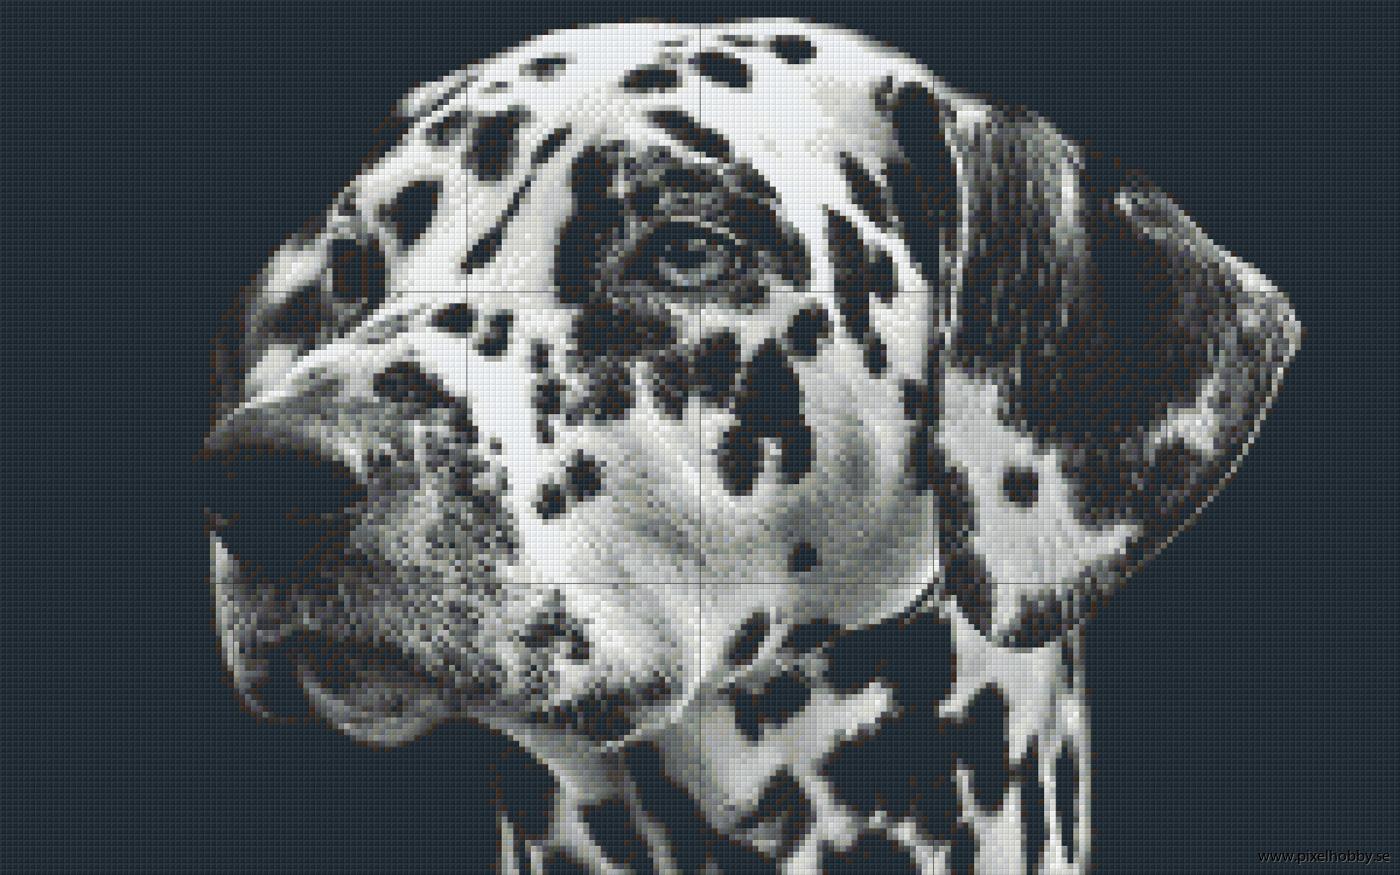 Dalmatiner 18 rbp